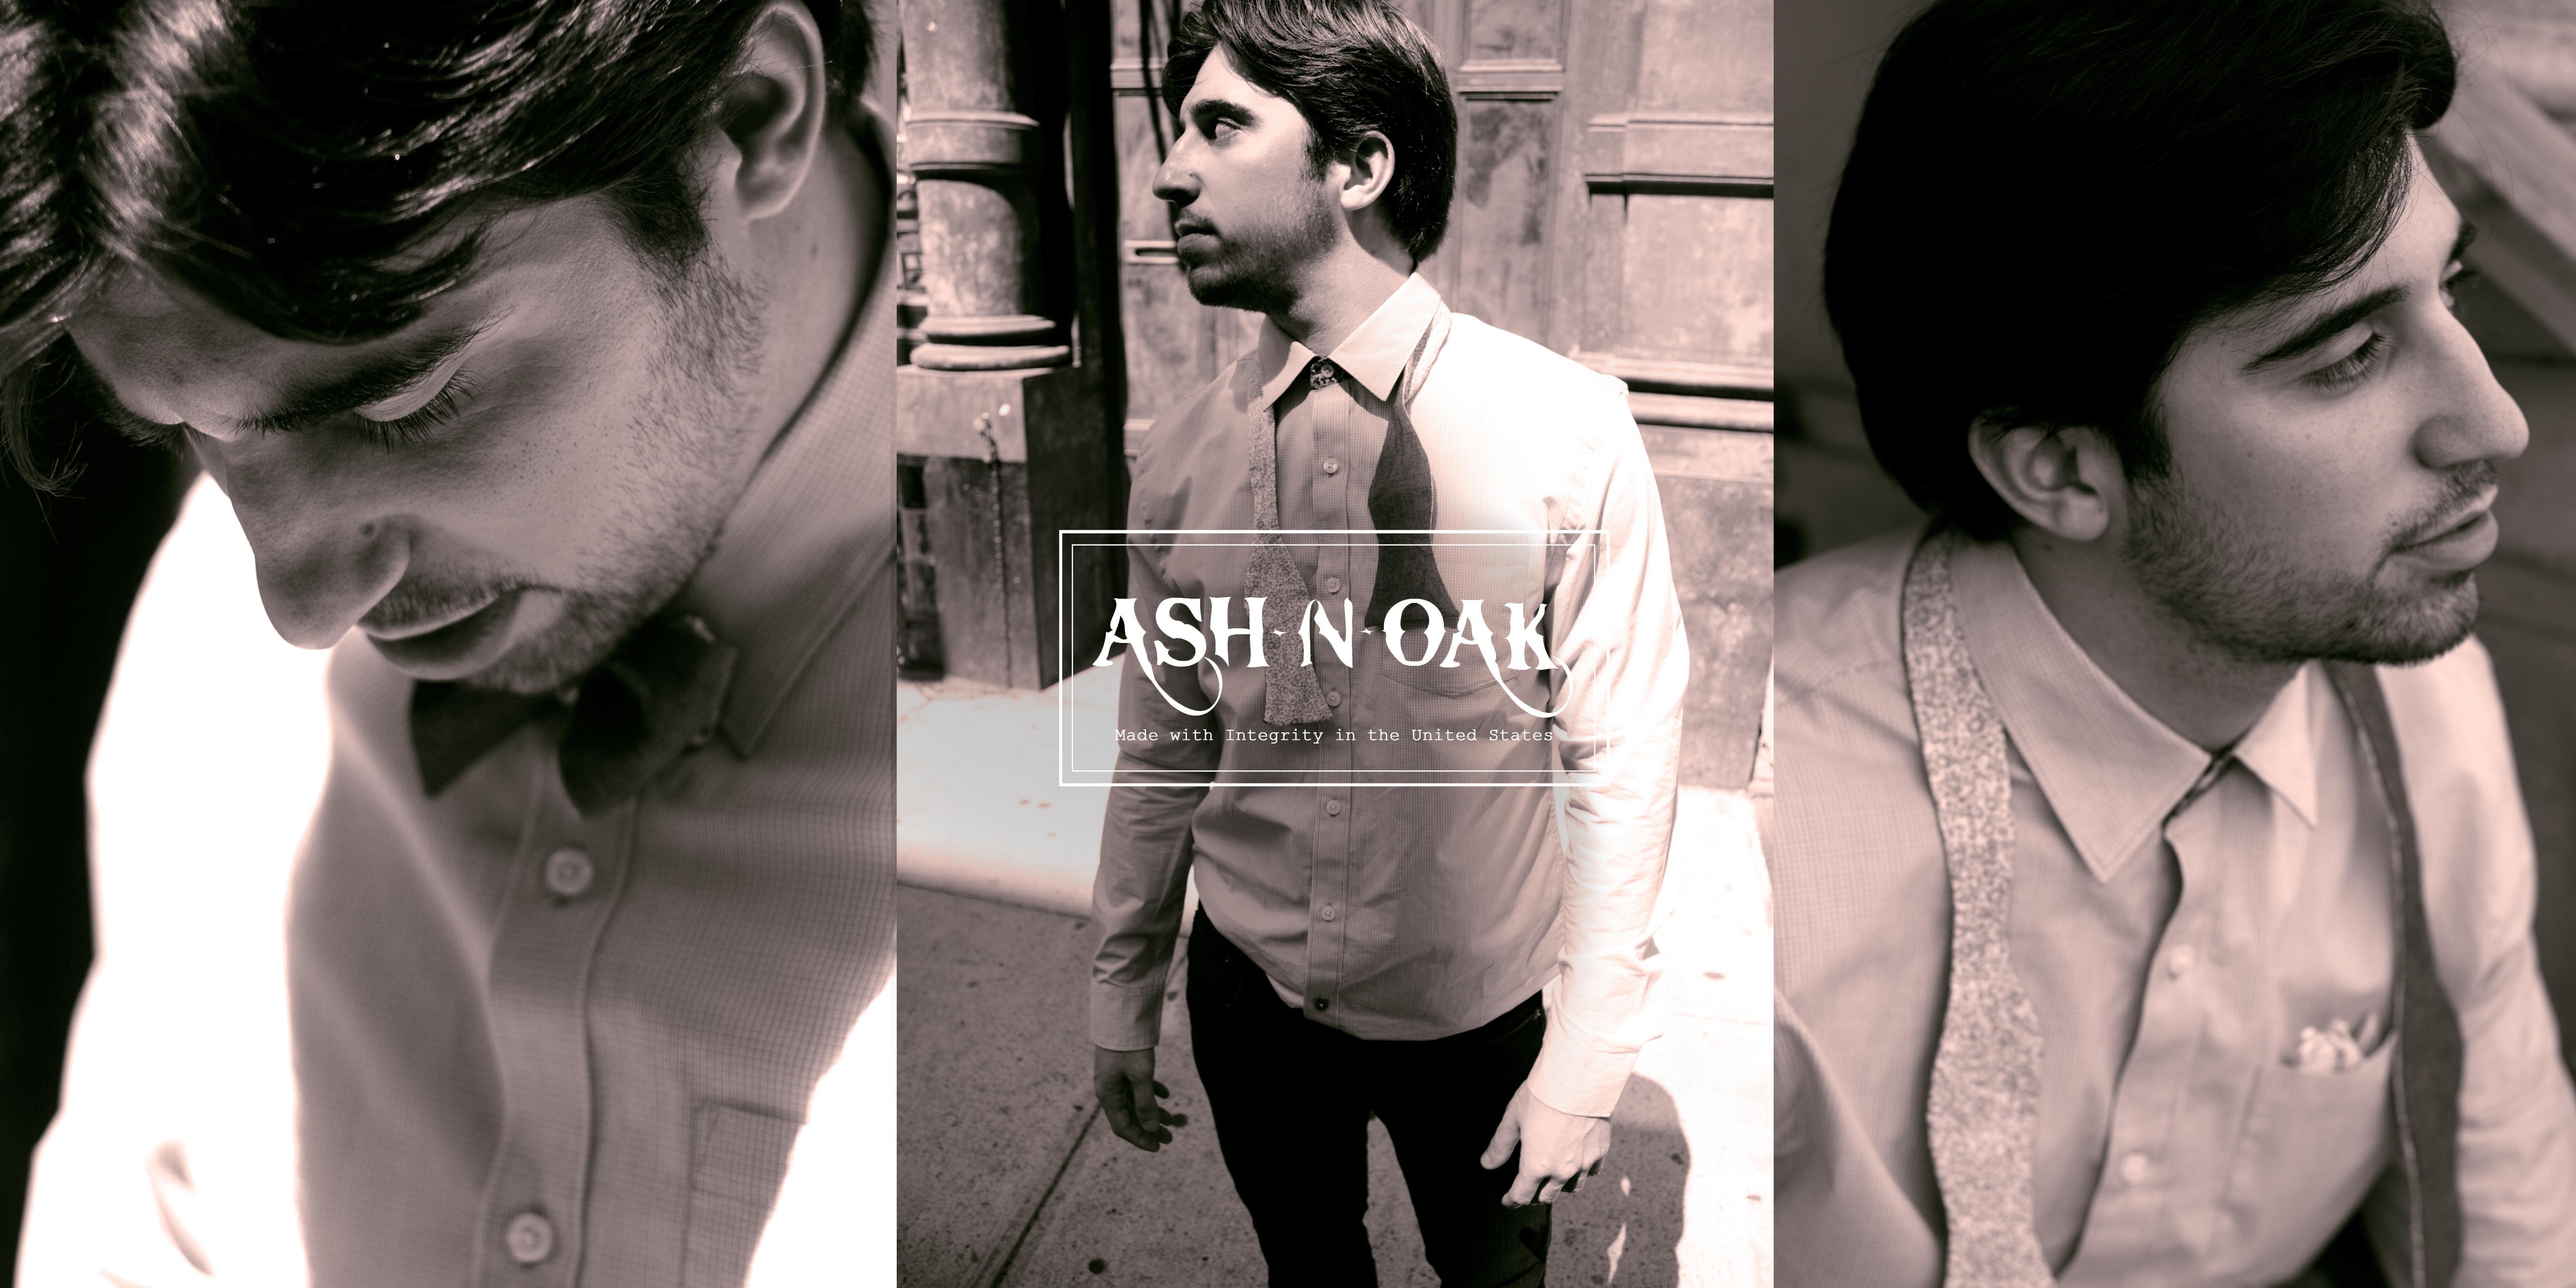 ASH n OAK COMP2